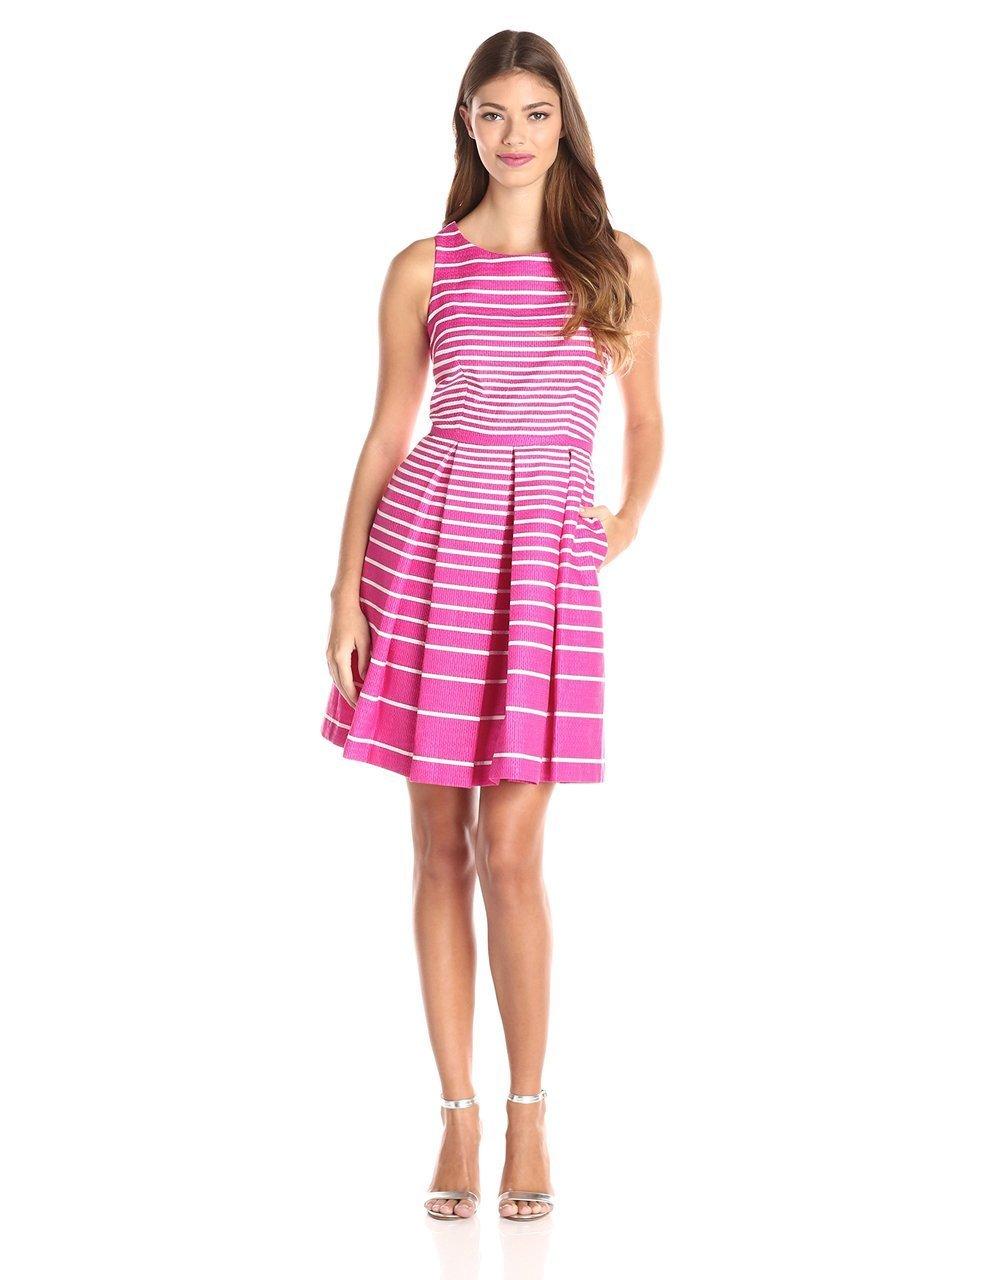 Taylor - 8074M Sleeveless Stripe Print Pleated Dress